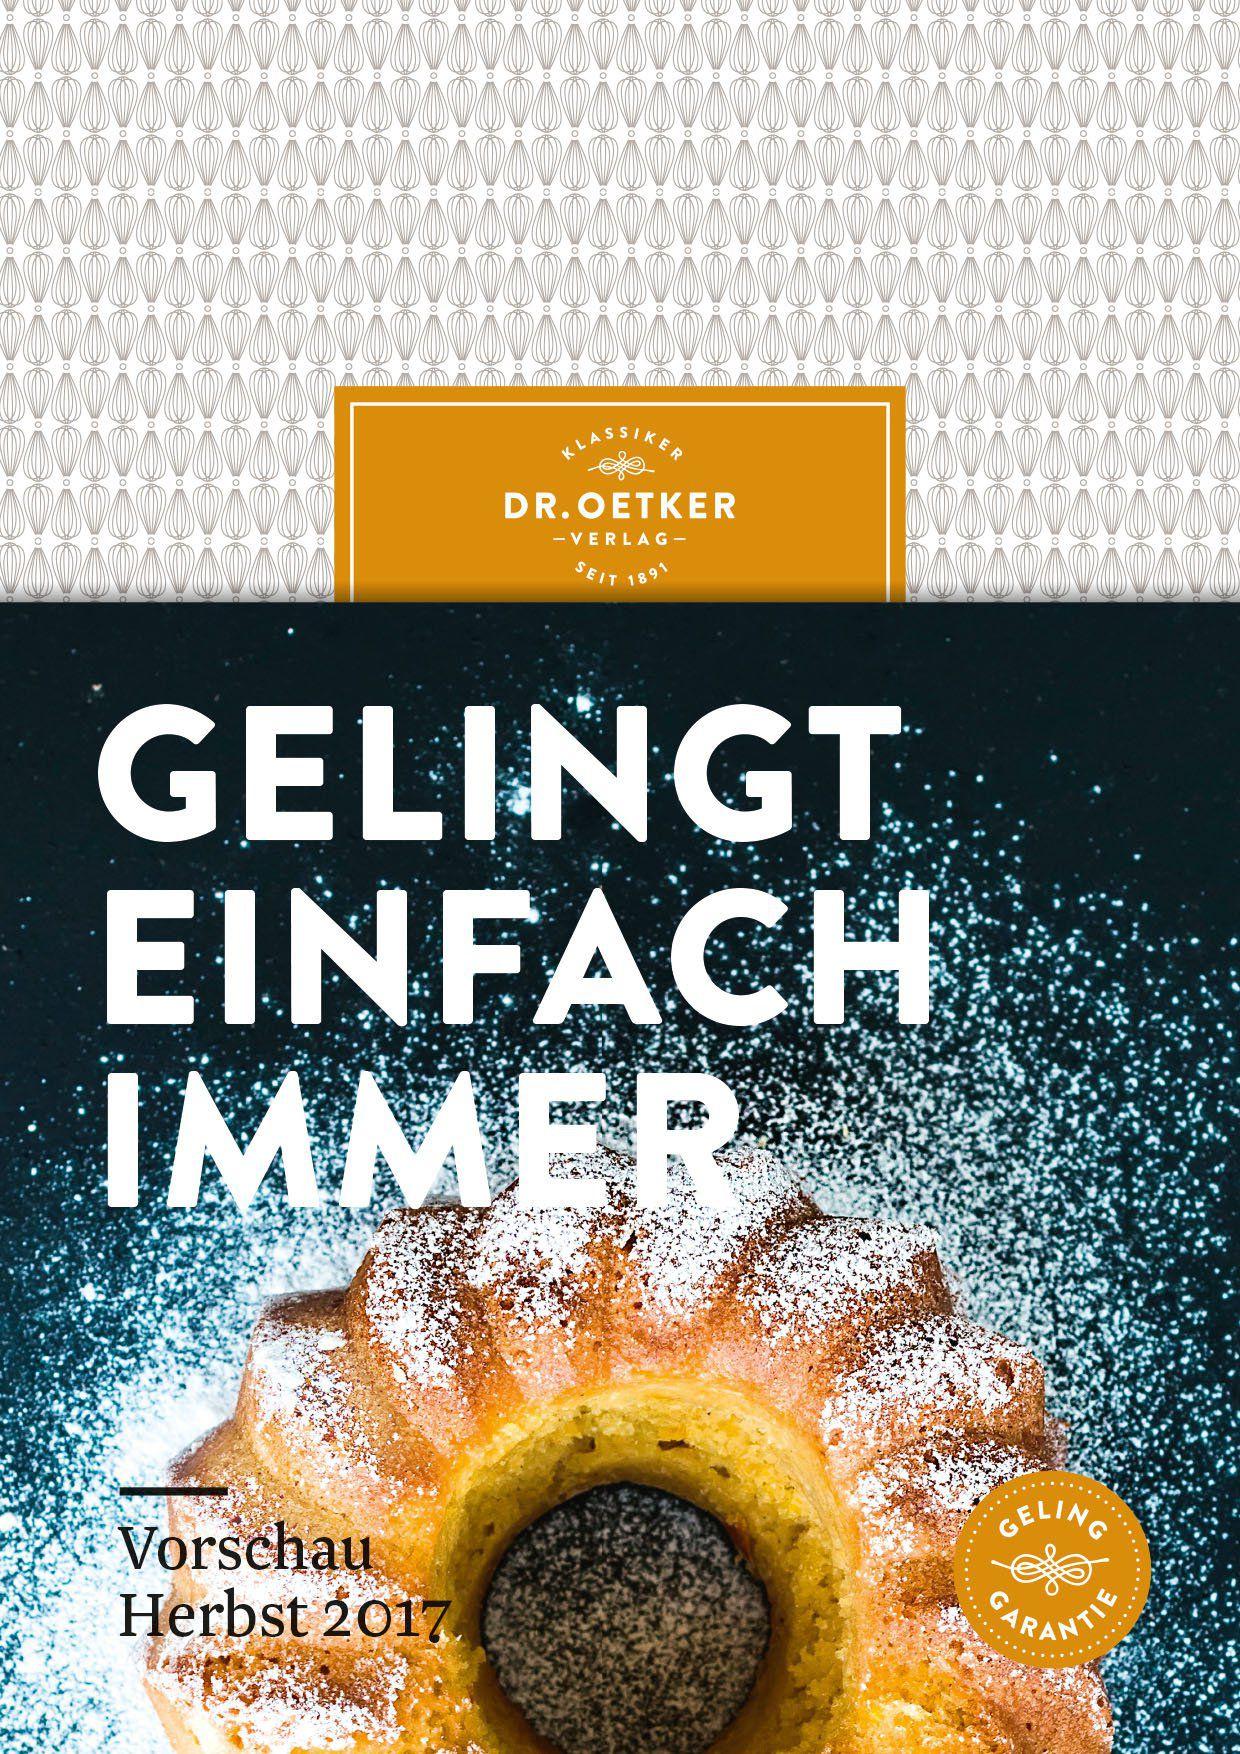 Dr. Oetker Verlag Herbst 2017